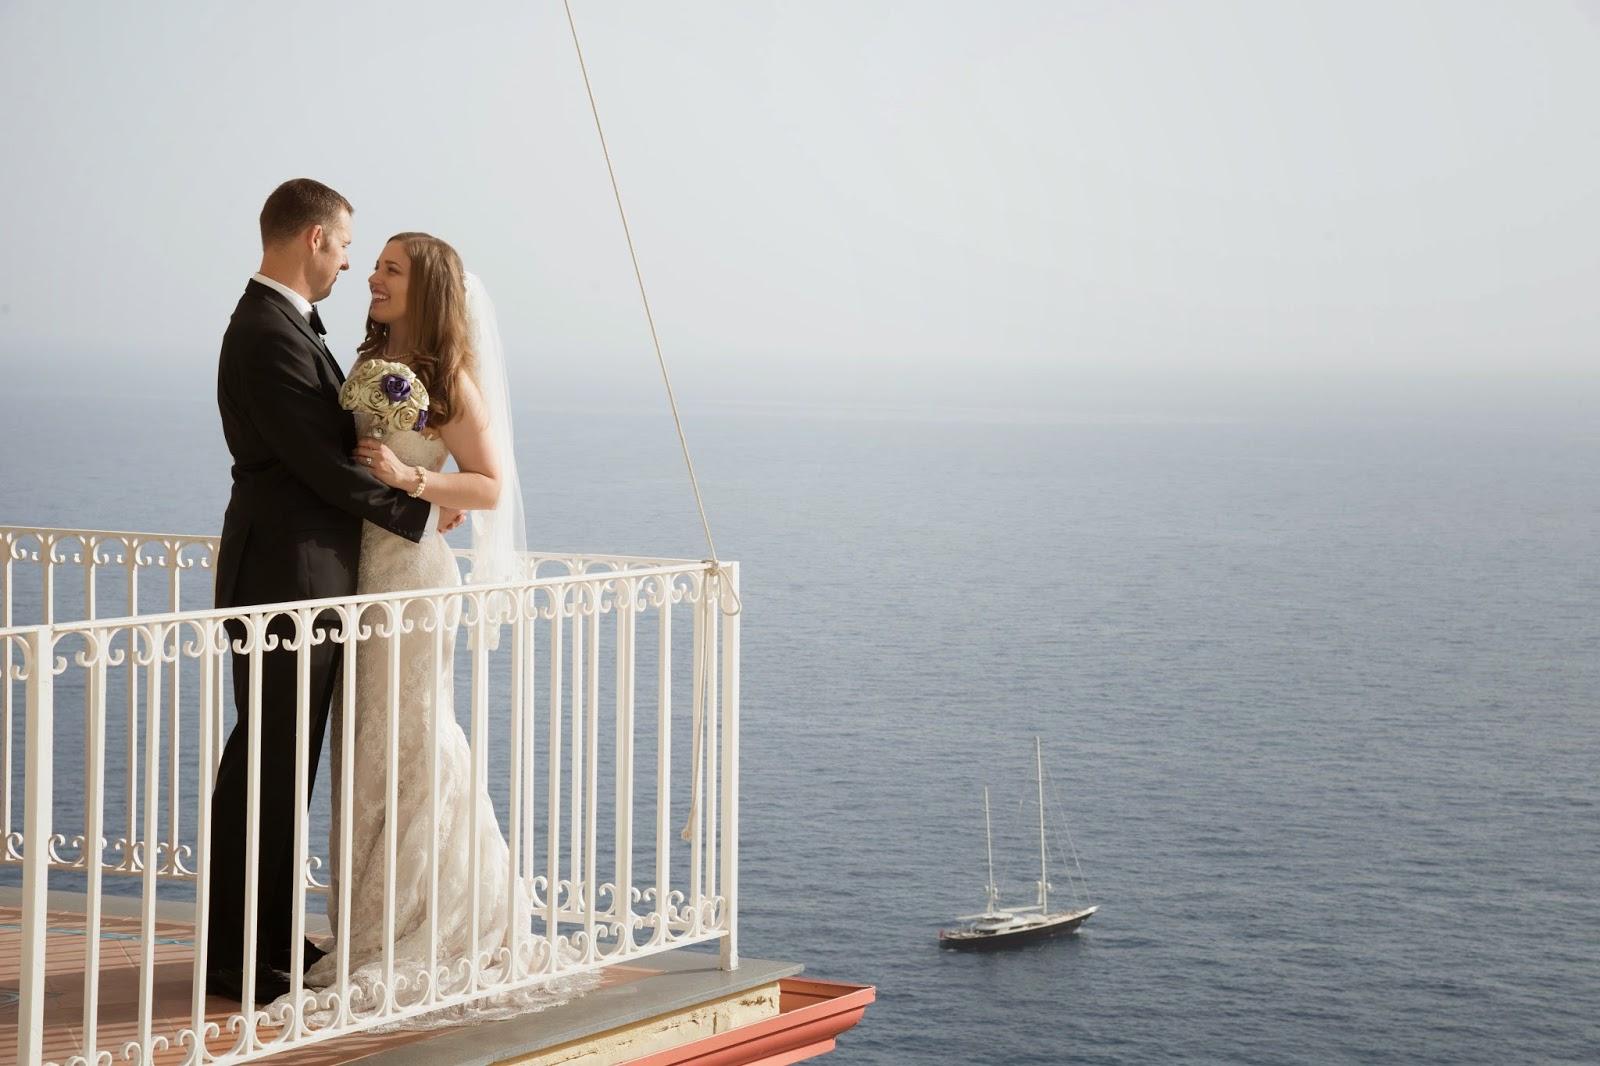 Weddings in Italy: Blessing Ceremonies in Rome | weddings Italy by ...